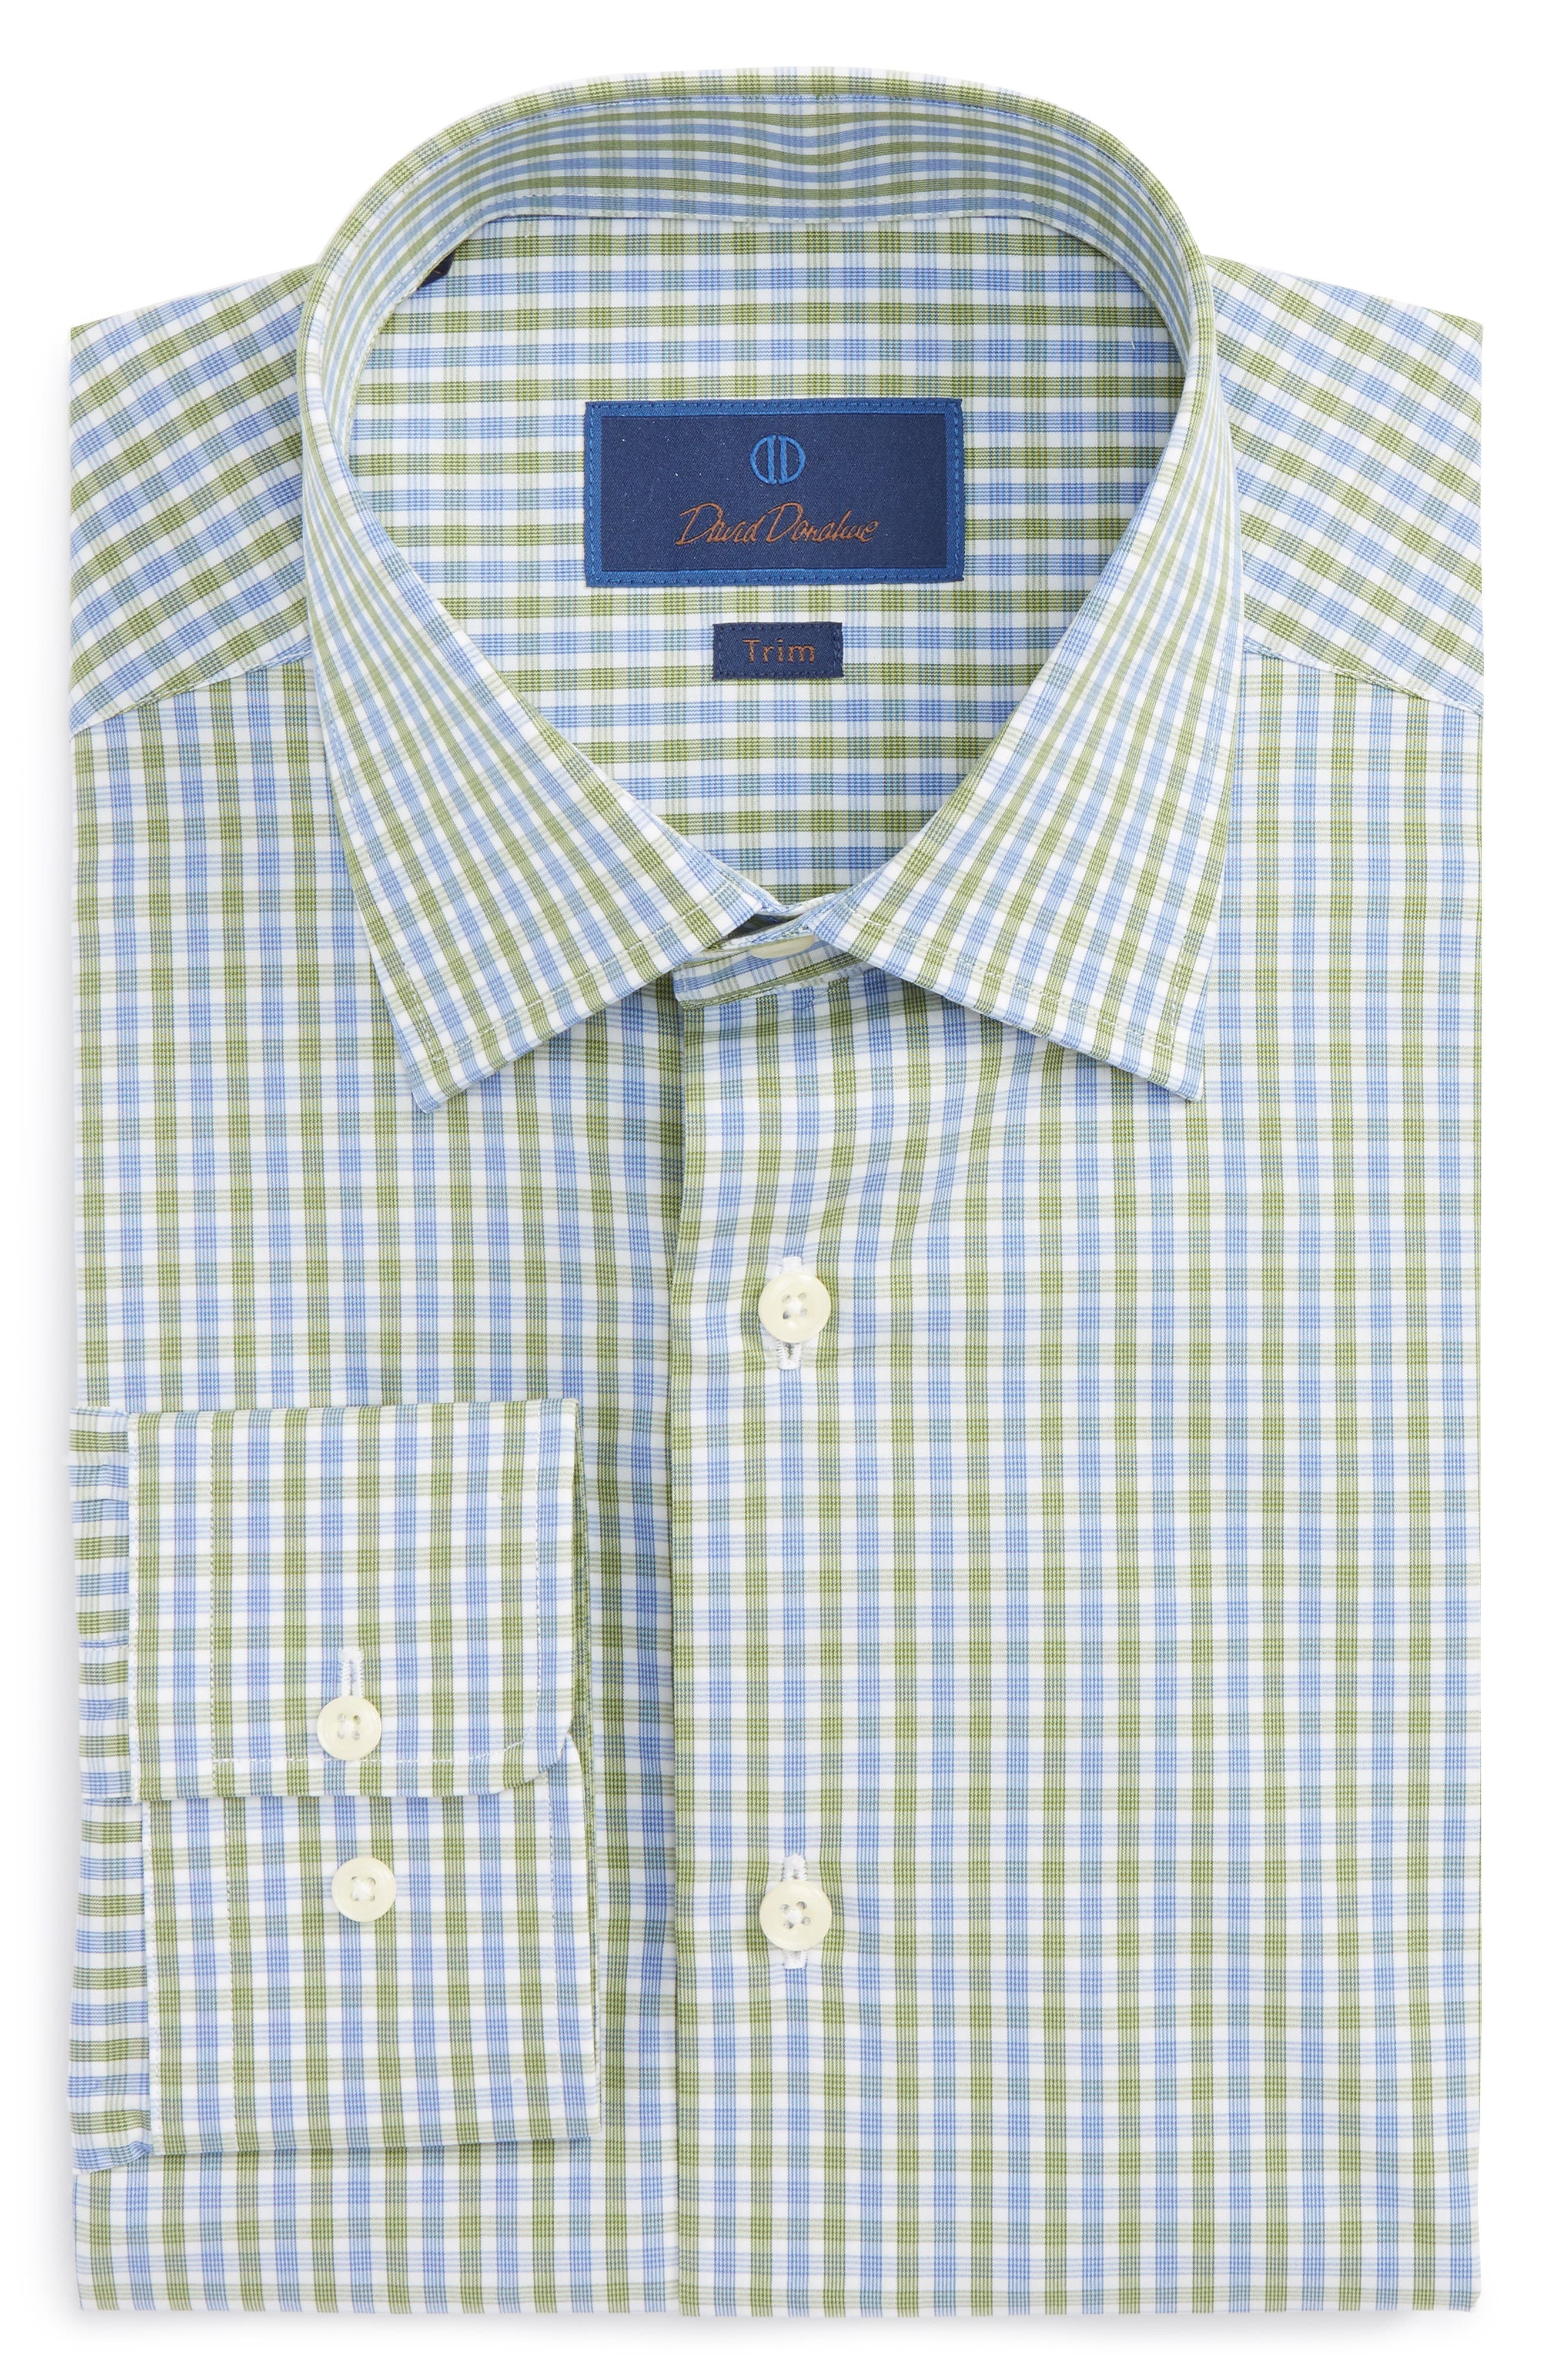 Trim Fit Check Dress Shirt,                             Main thumbnail 1, color,                             Blue/ Green